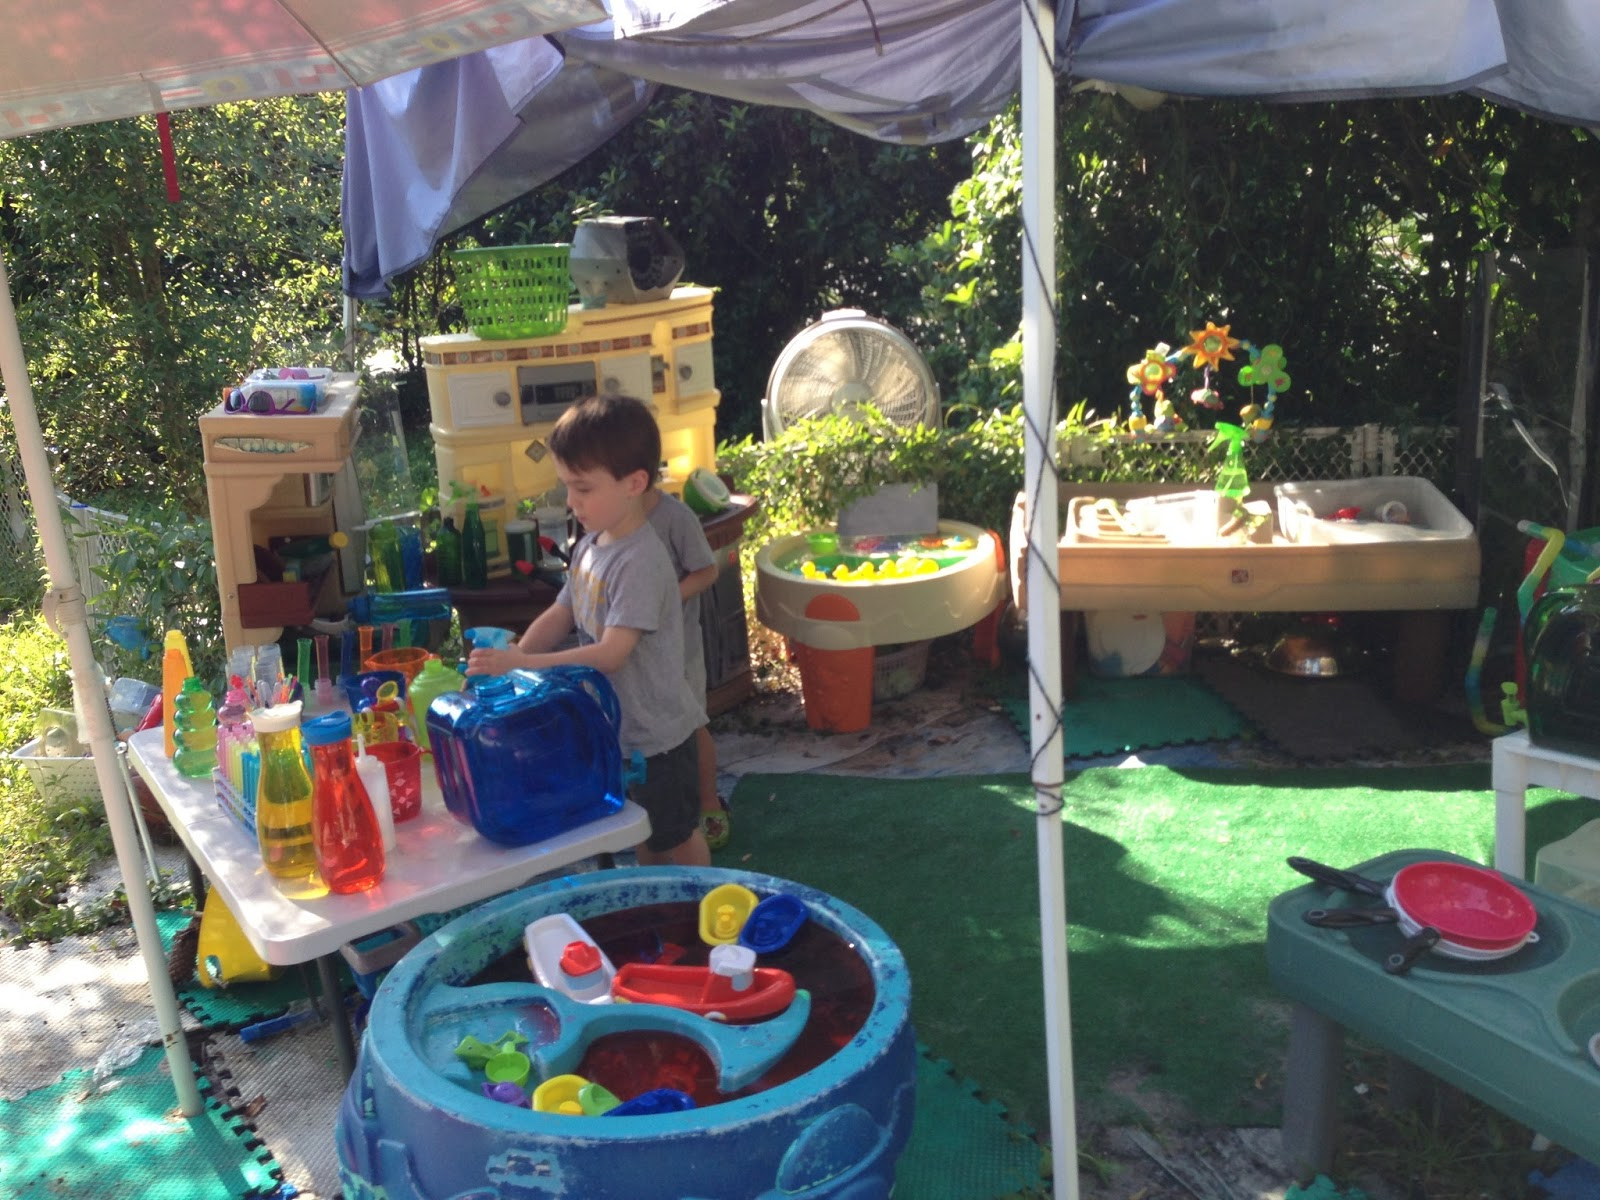 Rainbow snow slime & backyard play | Epic Childhood